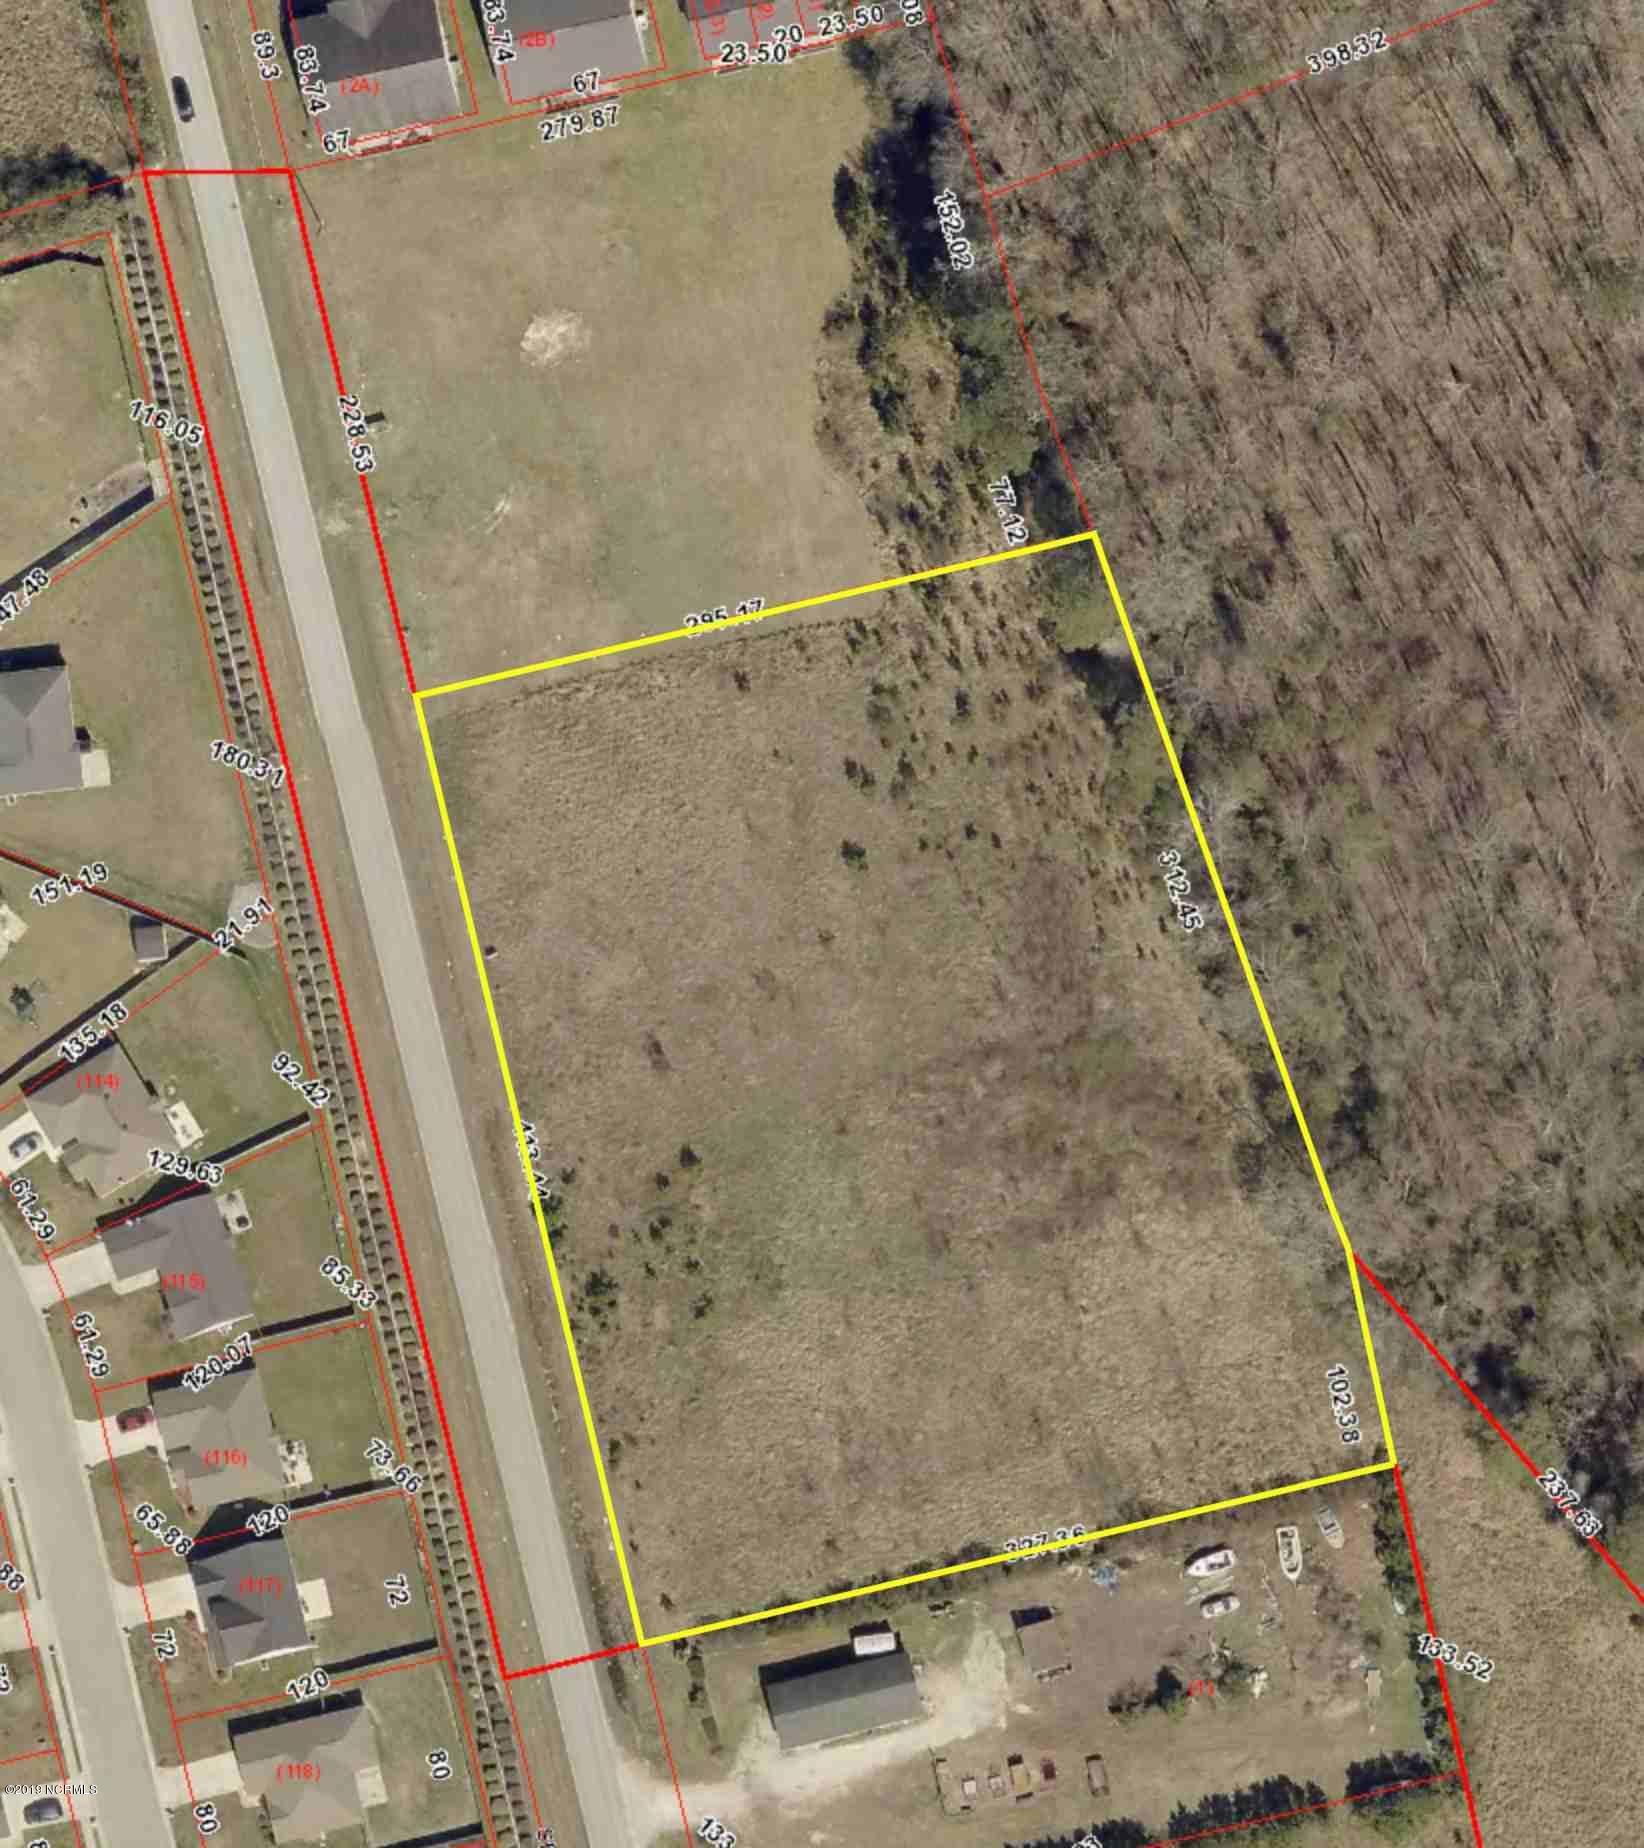 New Bern, North Carolina 28562, ,Undeveloped,For sale,100190471